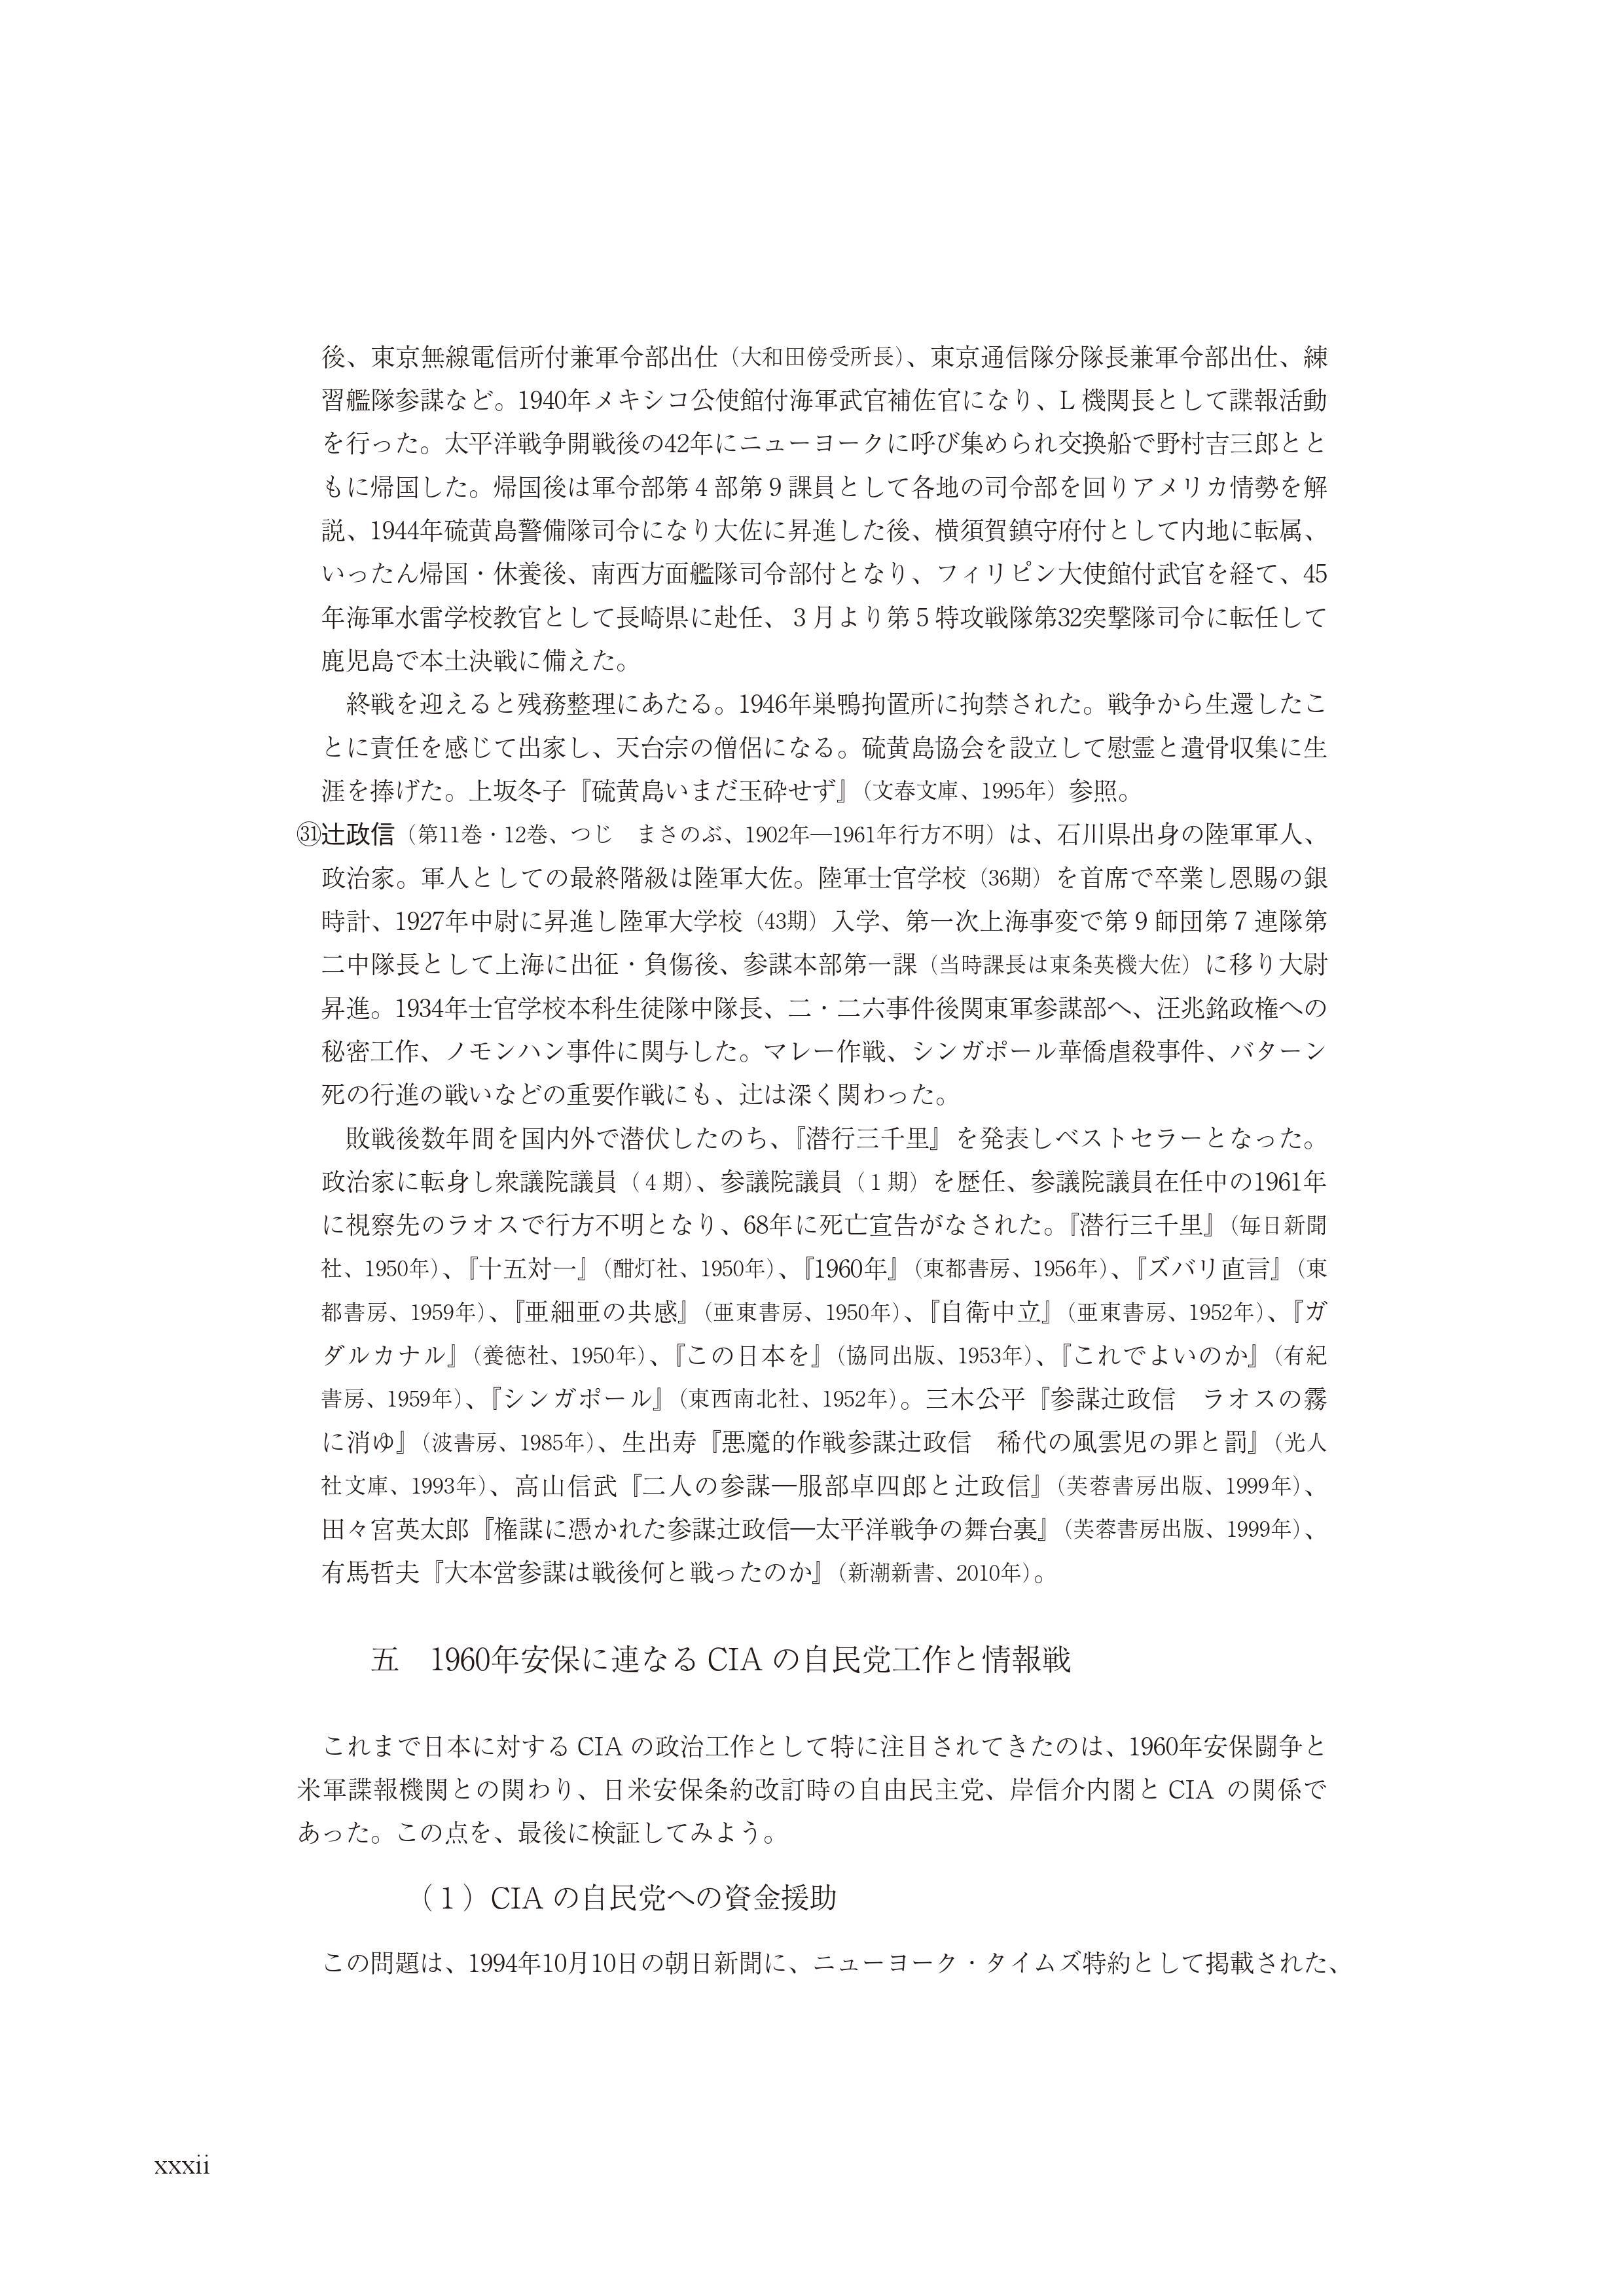 CIA日本人ファイル0001 (32)